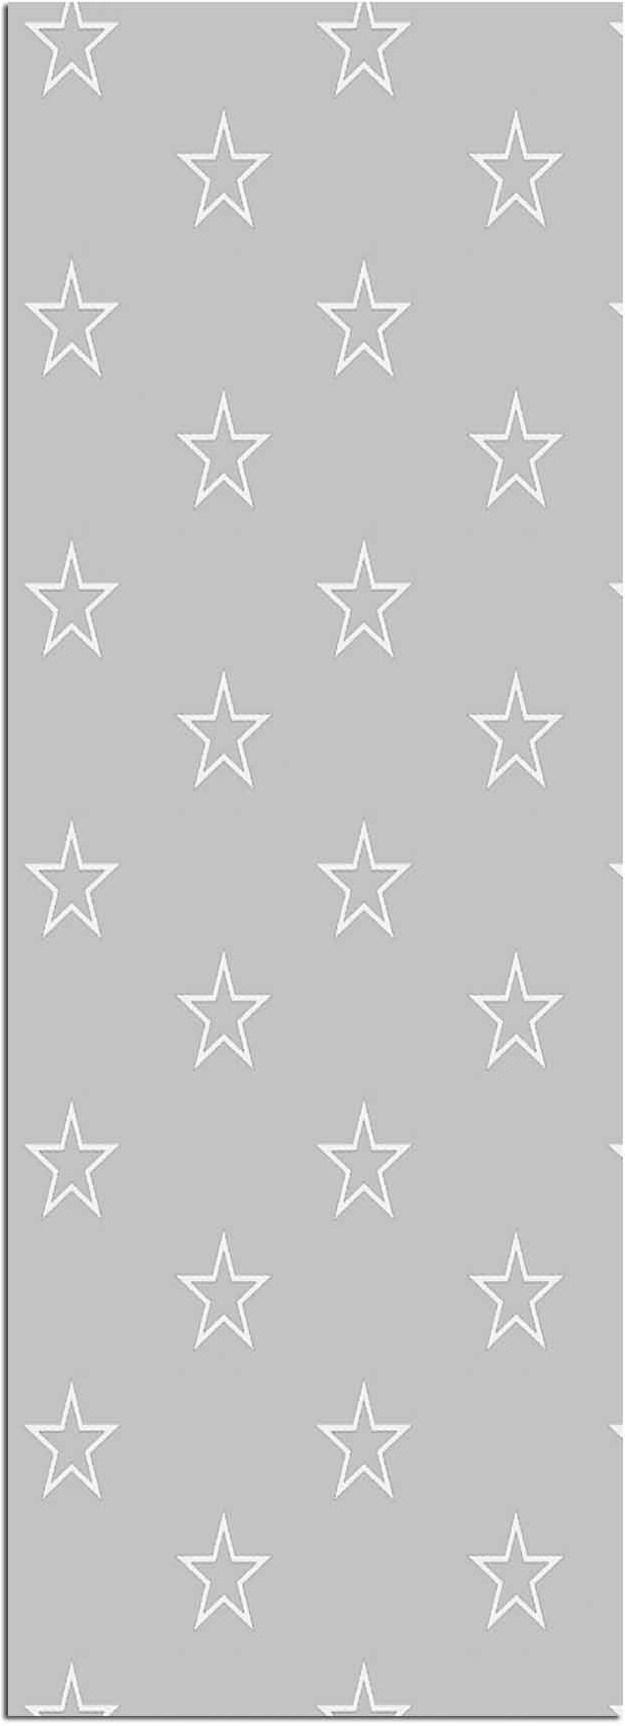 40047 Bolsa 12X40 Estrellas Blancas Image